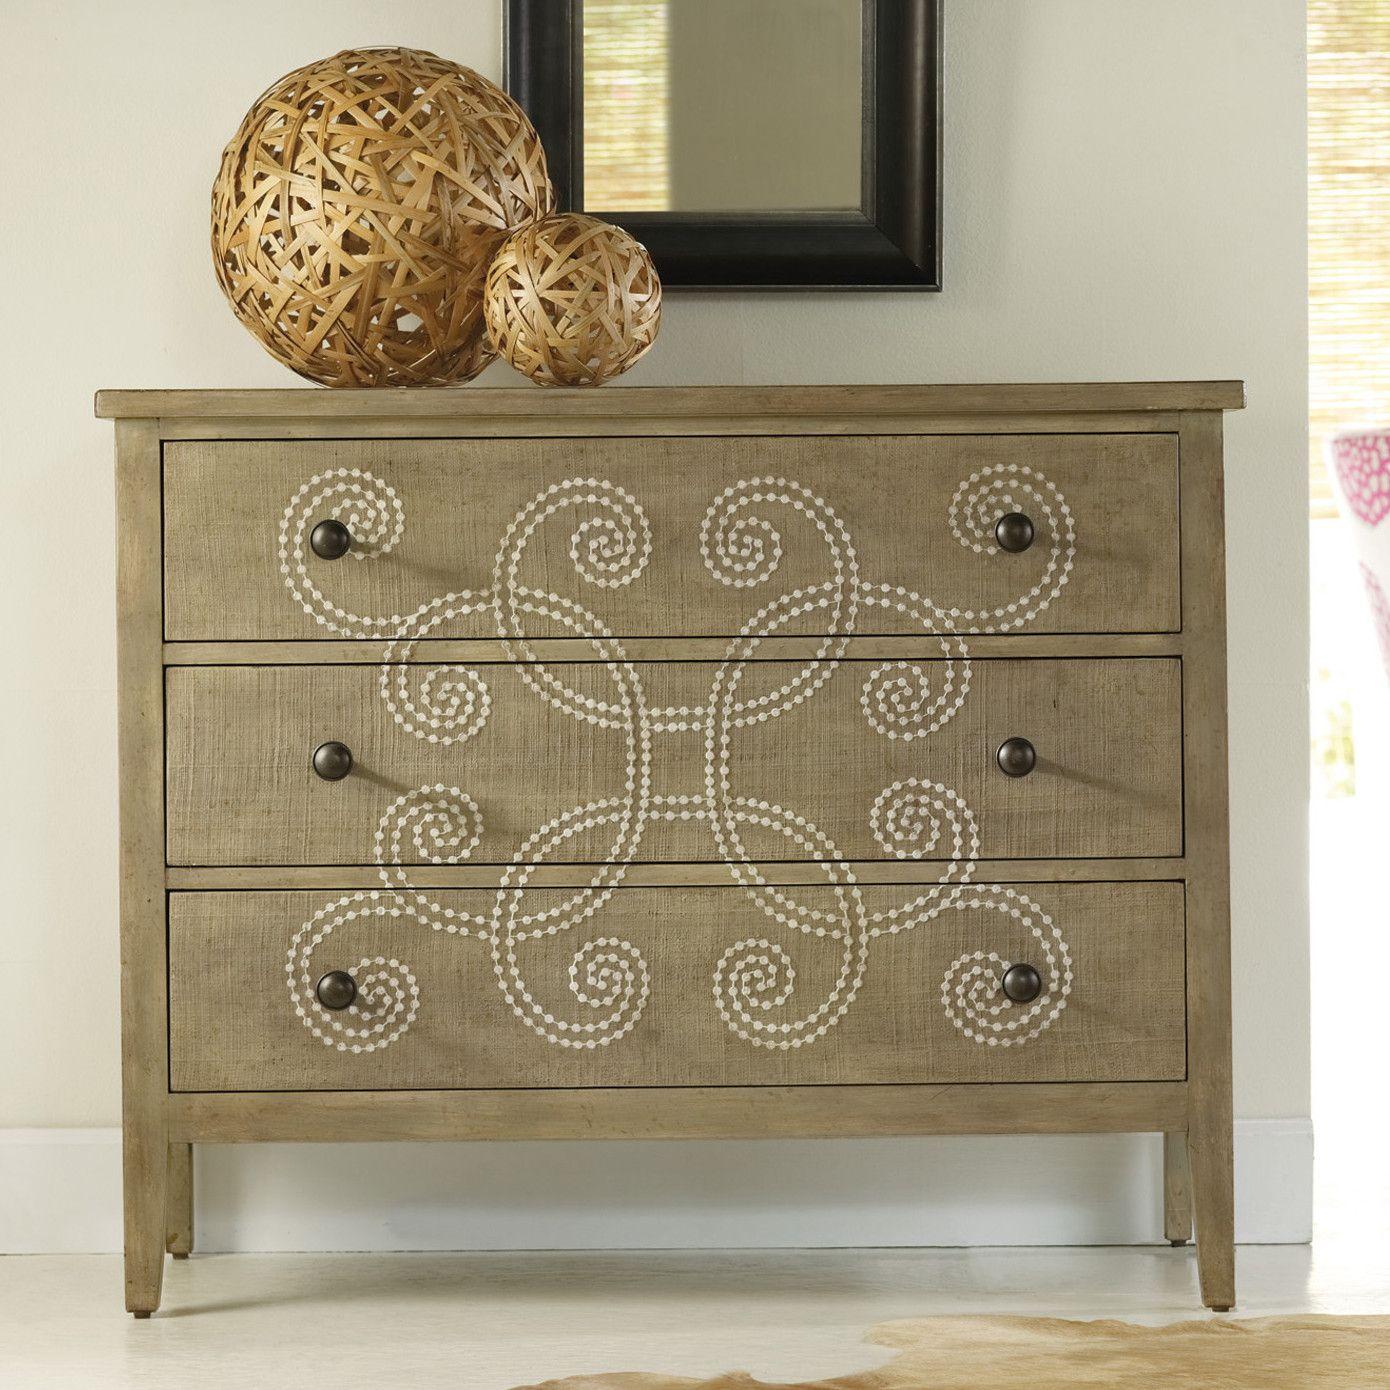 hooker furniture melange curlacue 3 drawer chest clous tapissier mobilier de salon meuble. Black Bedroom Furniture Sets. Home Design Ideas